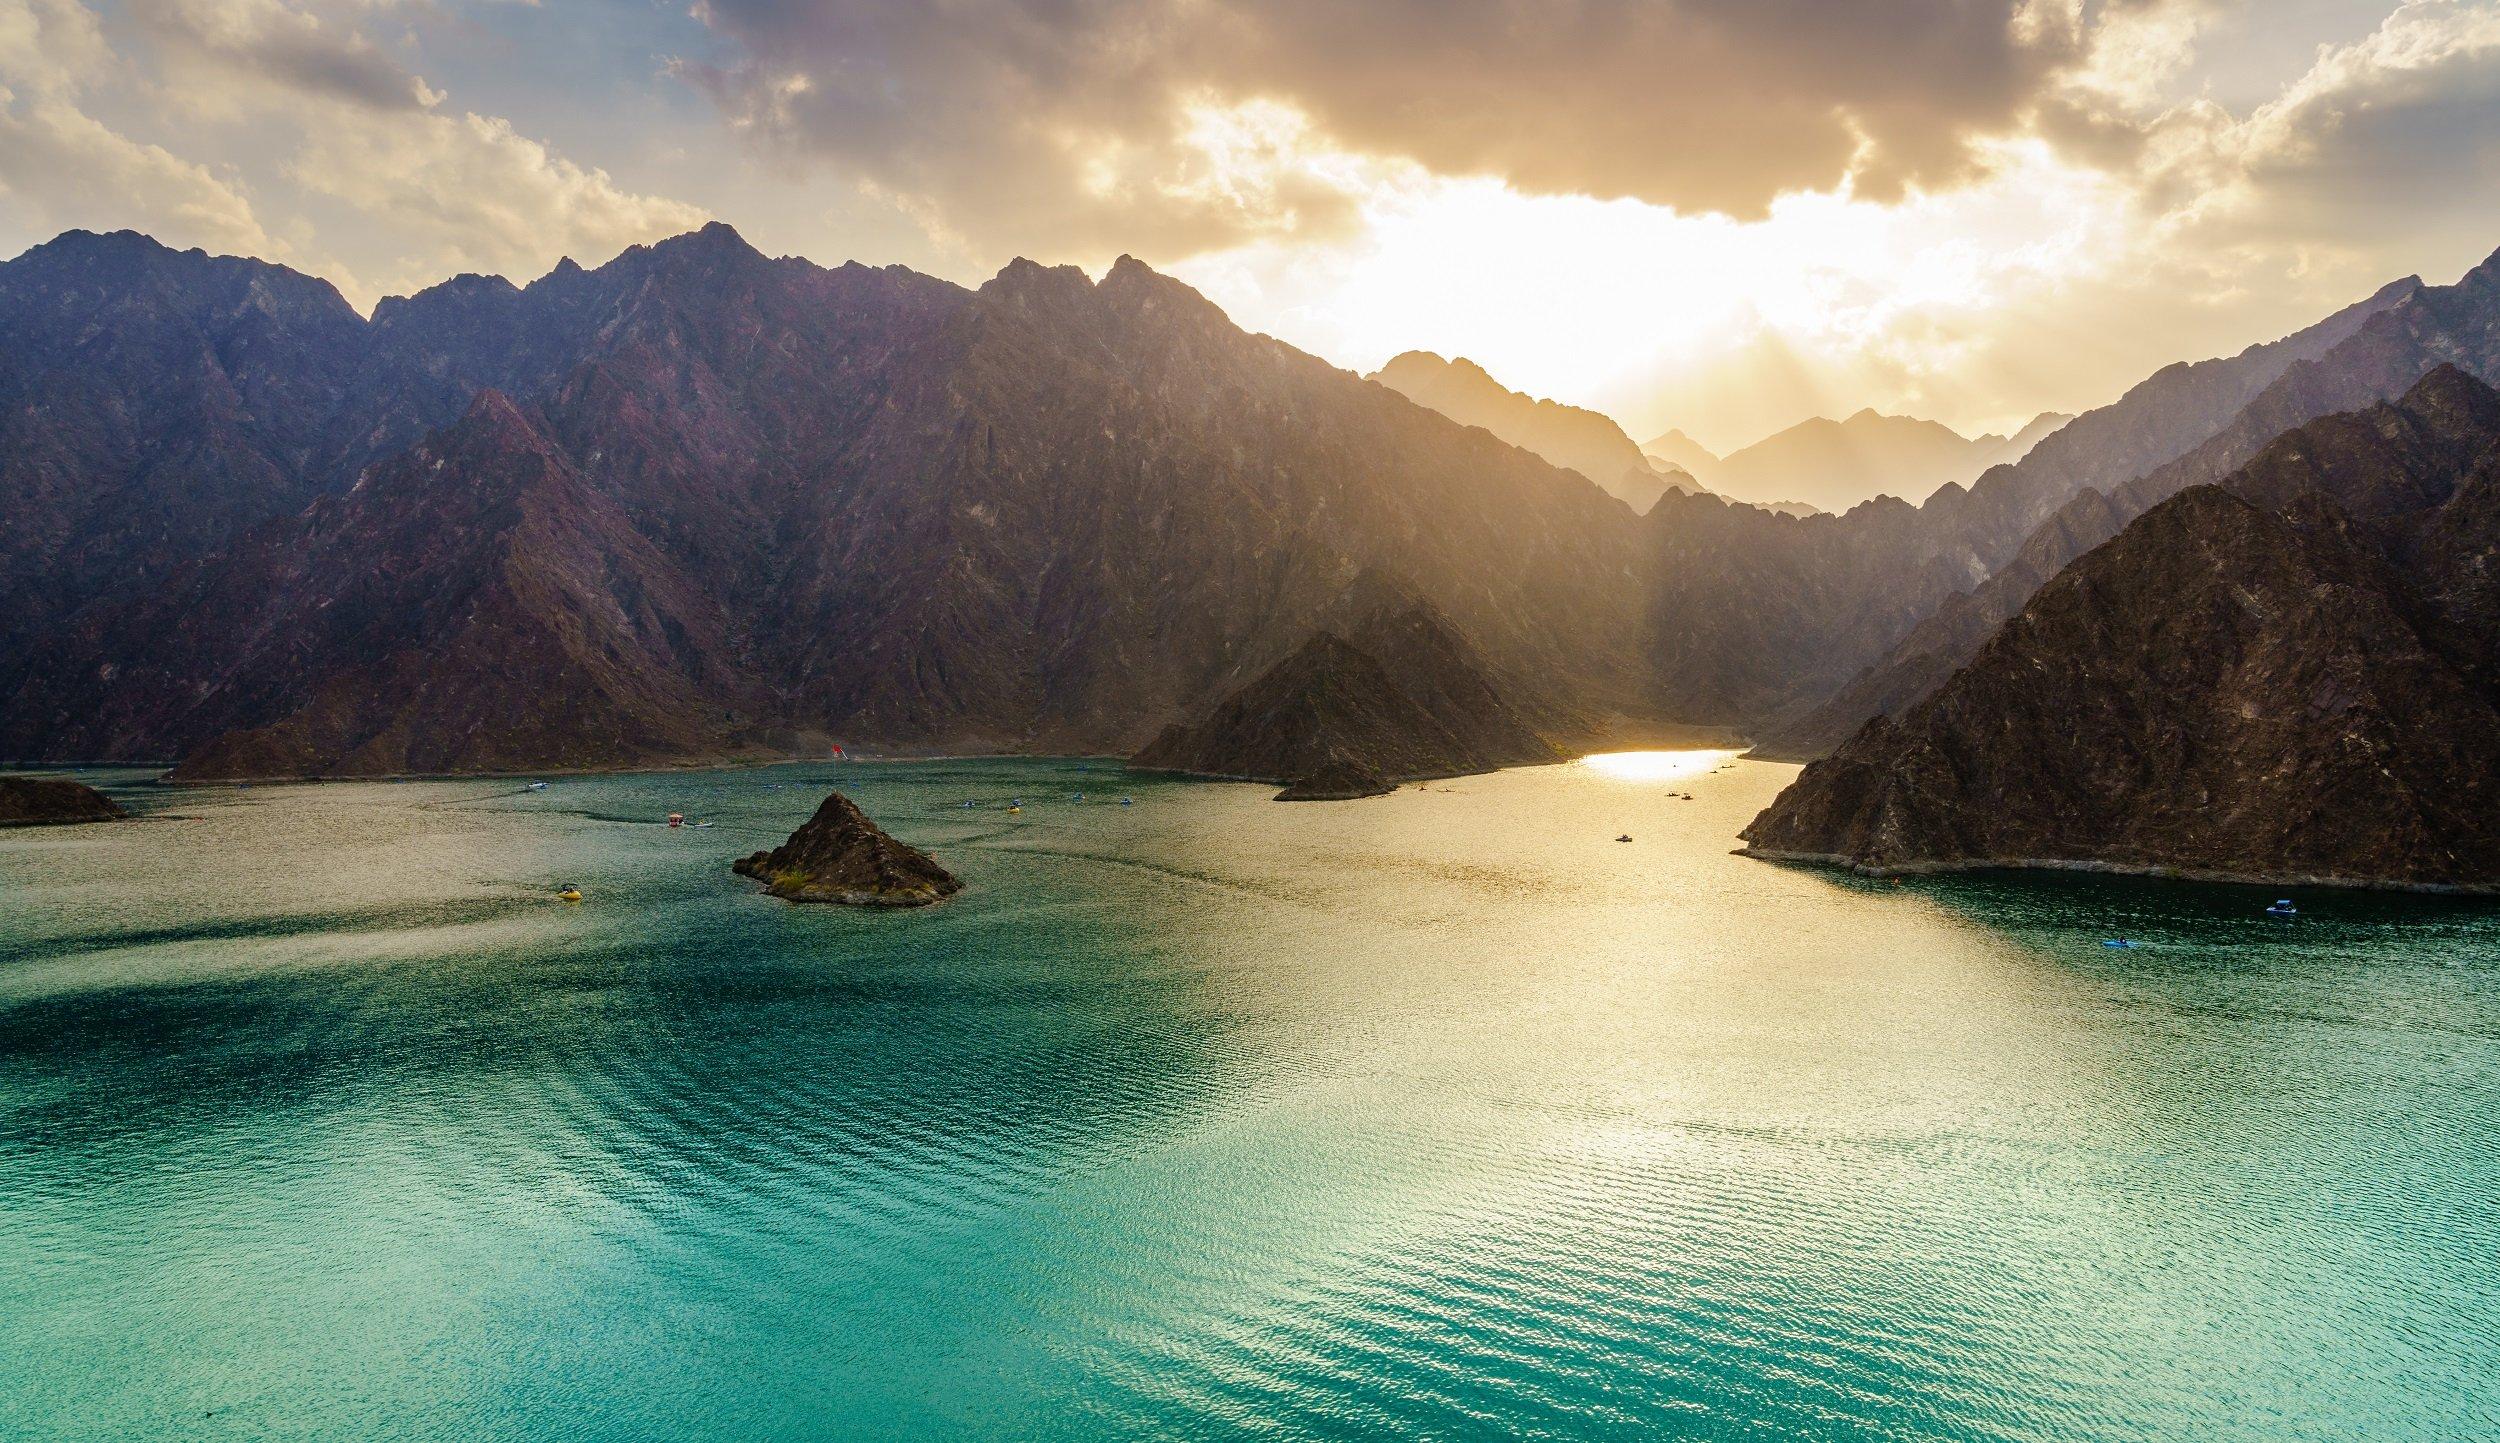 Hatta Mountain Safari Tour From Dubai_hatta Lake